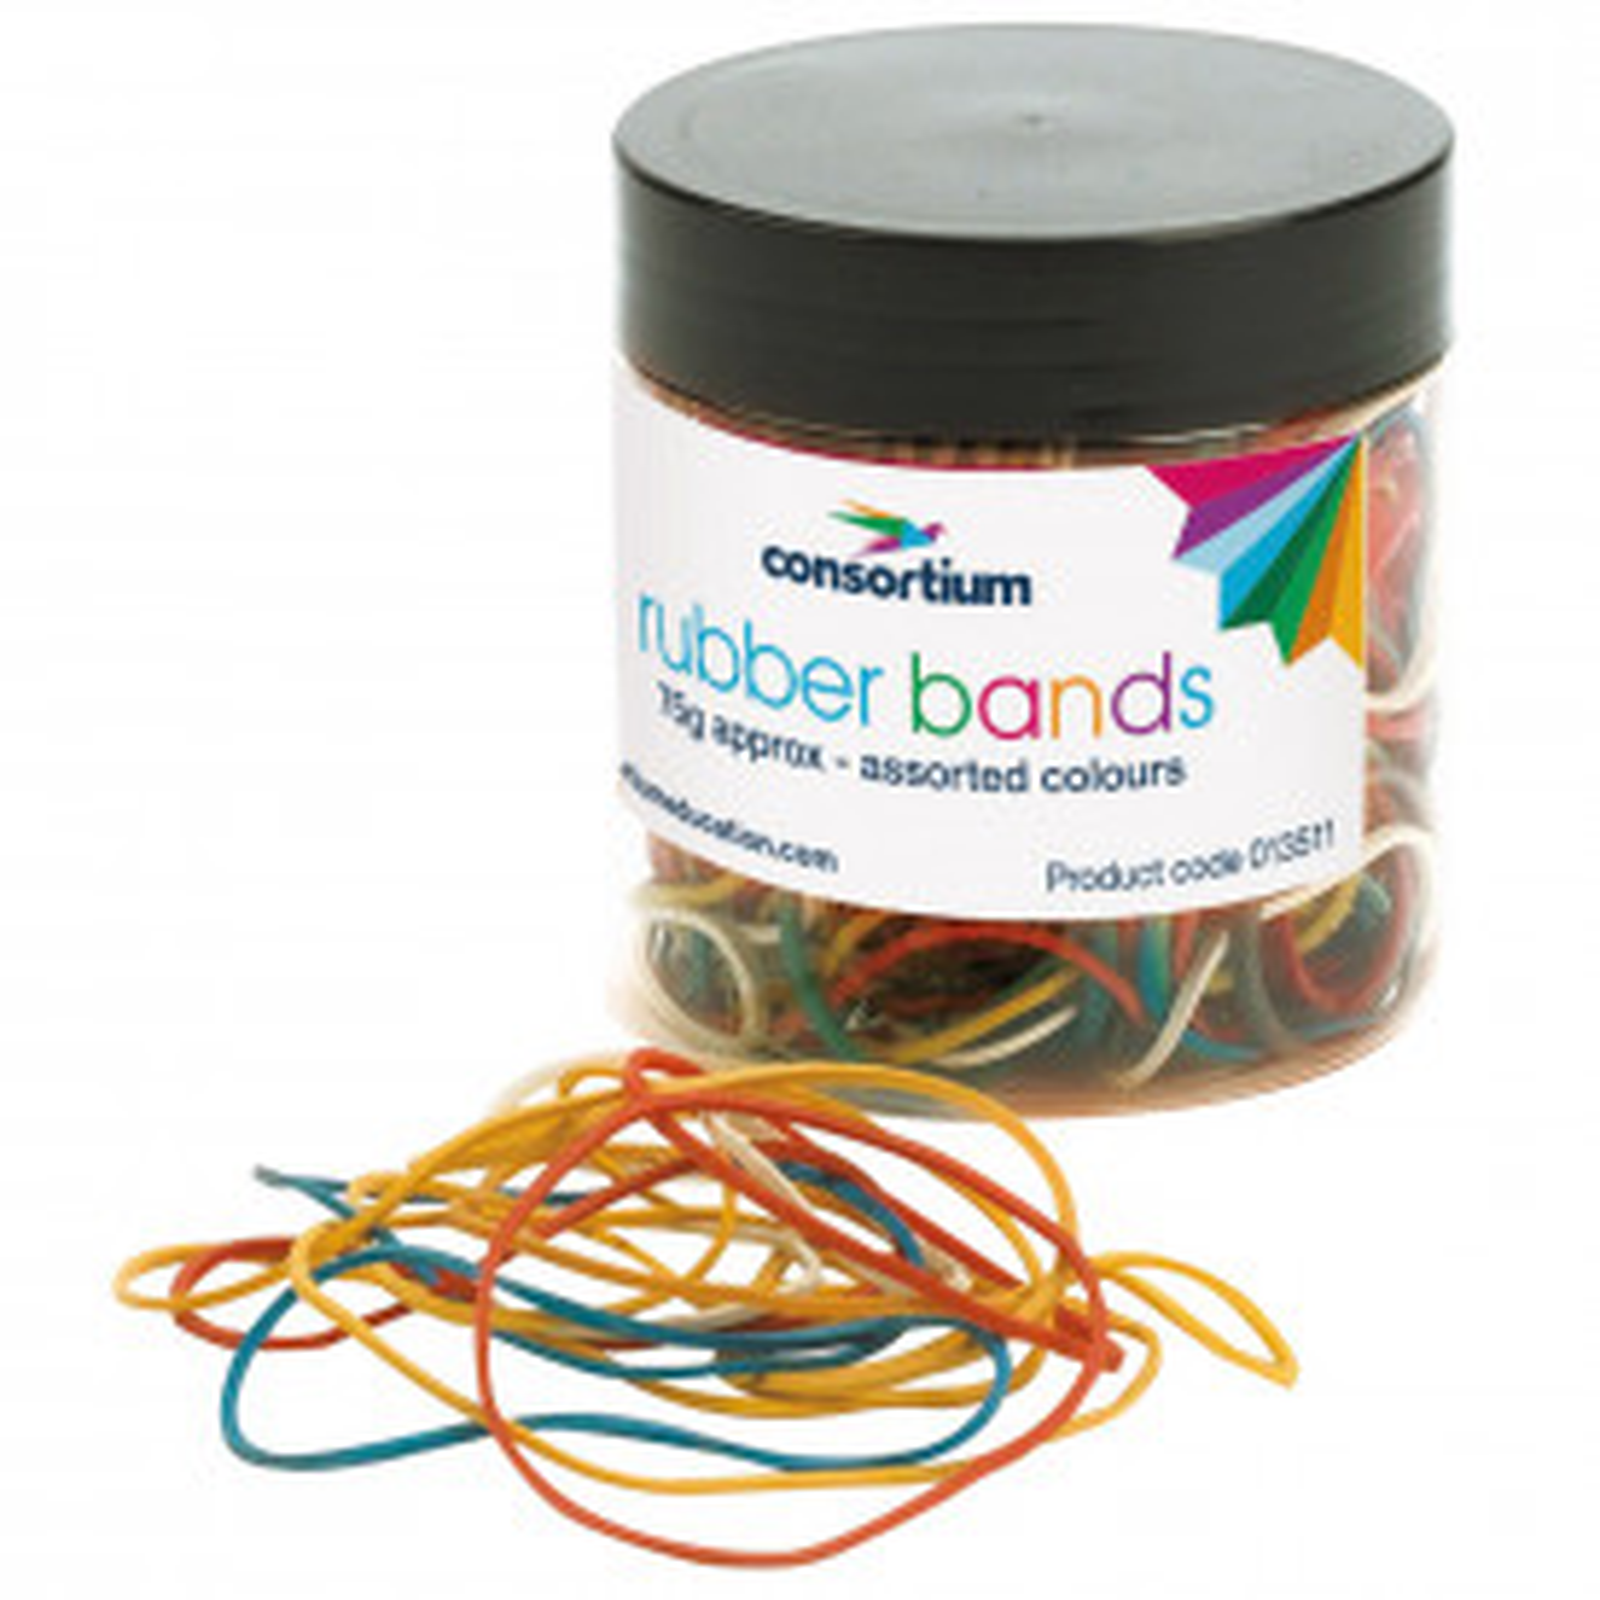 Consortium Rubber Bands